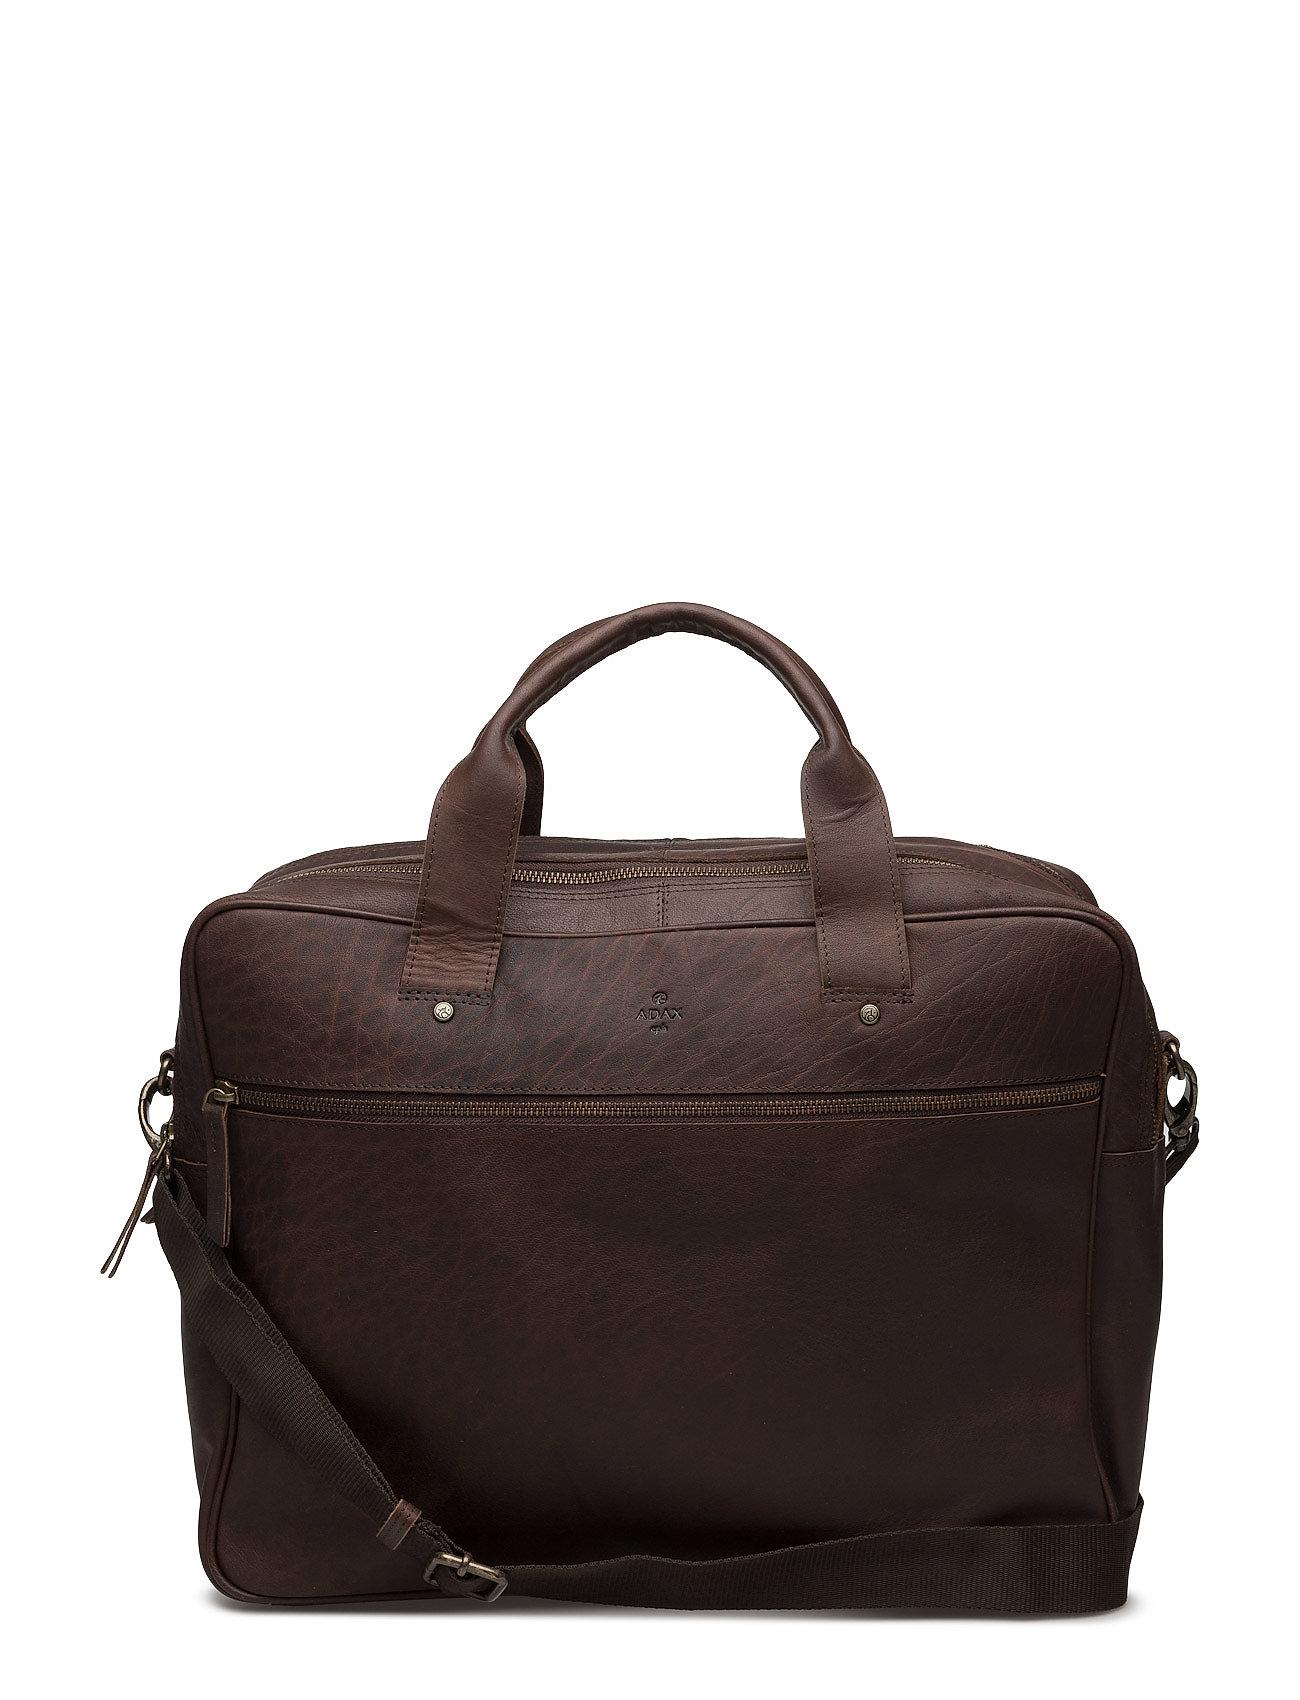 Adax KB3 working bag Liam - BROWN